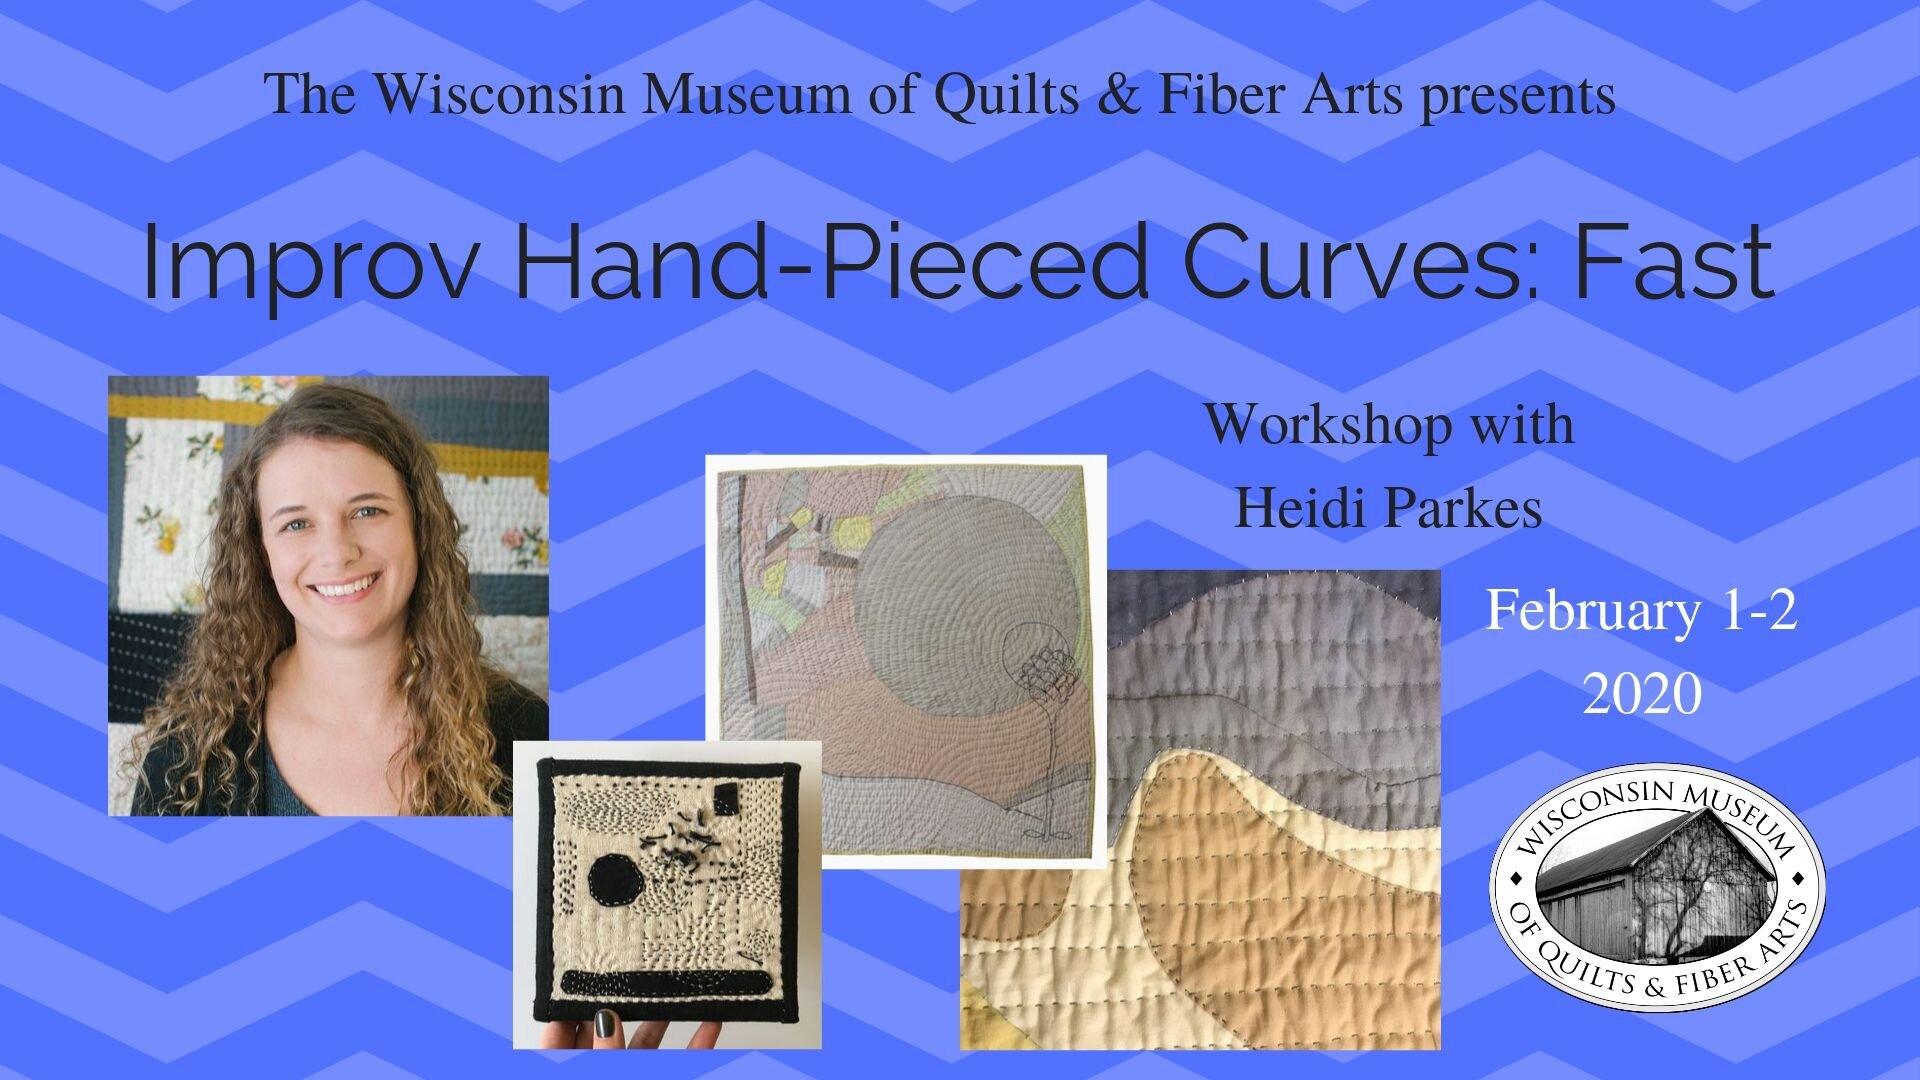 Improv Hand-Pieced Curves_ Fast! with Heidi Parkes.jpg